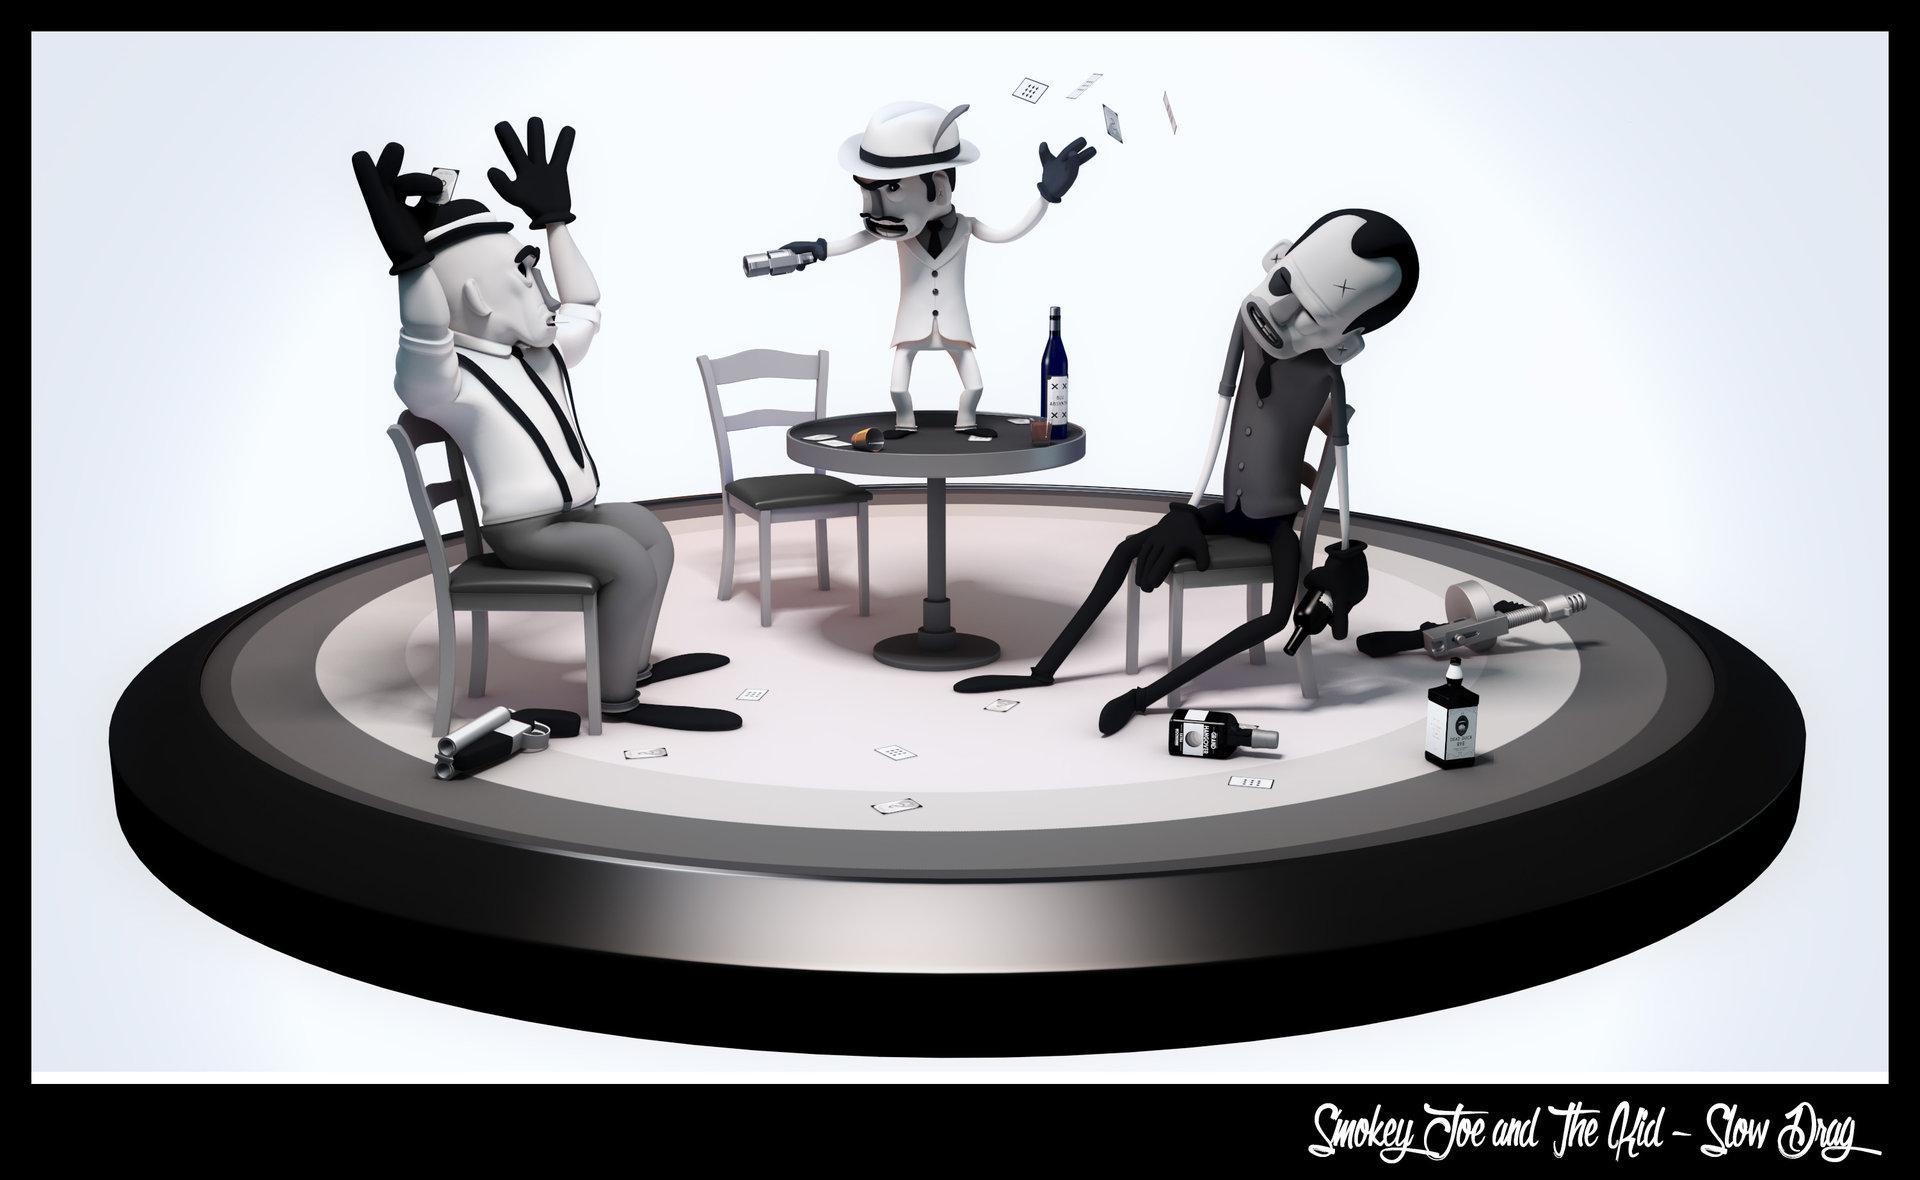 smokey joe and the kid slow drag animation 3d paris victor jardel